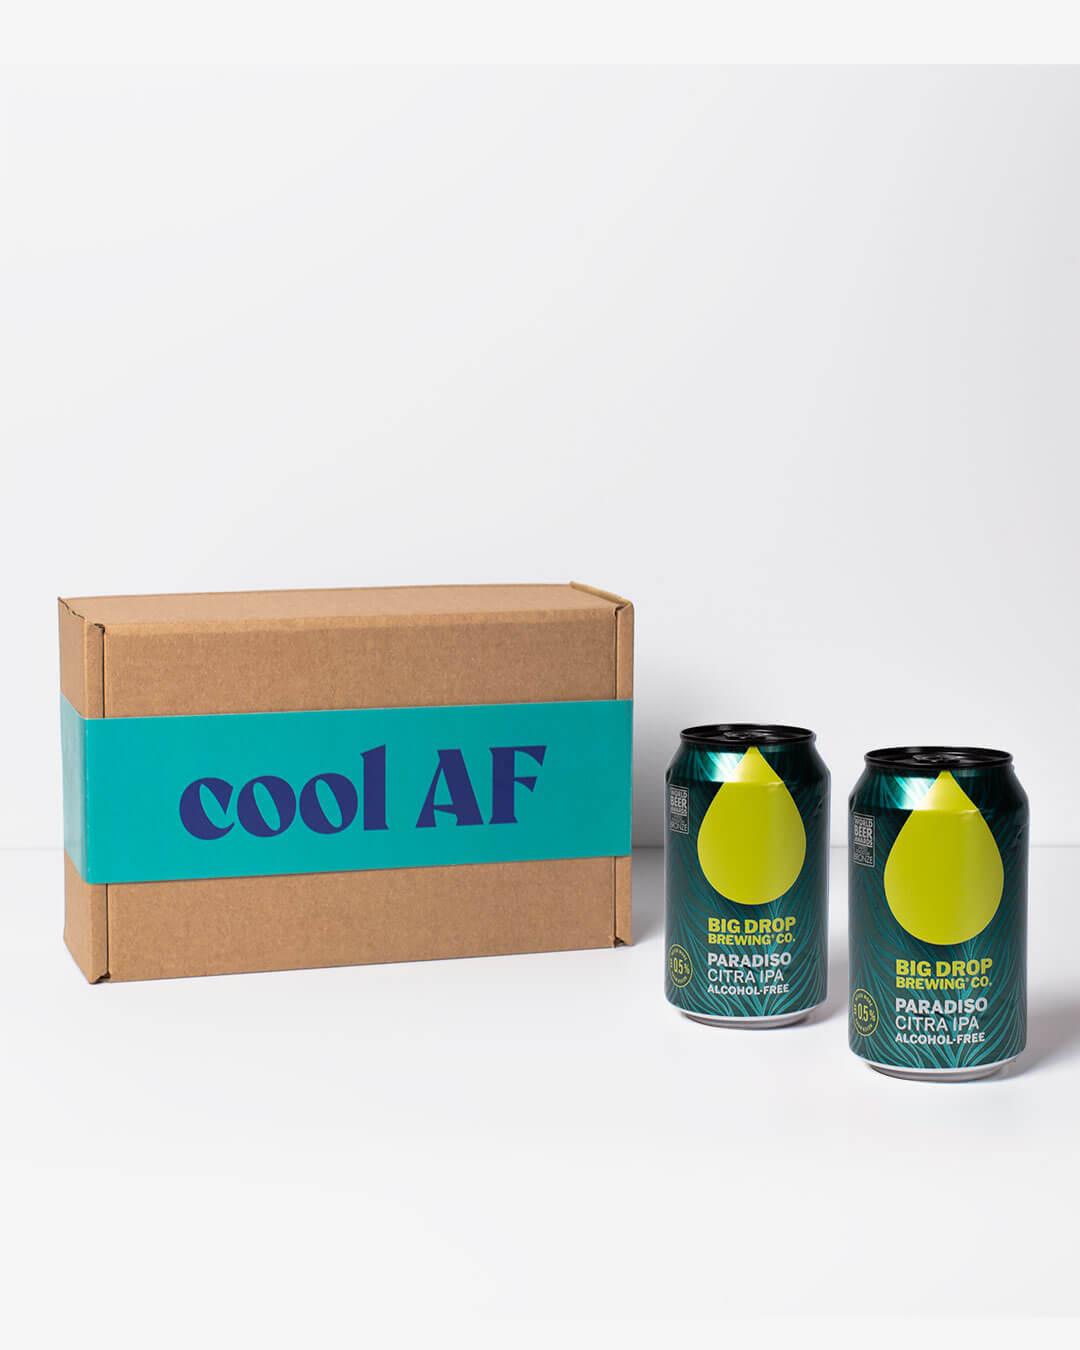 Big Drop alcohol free IPA cans & ta. box